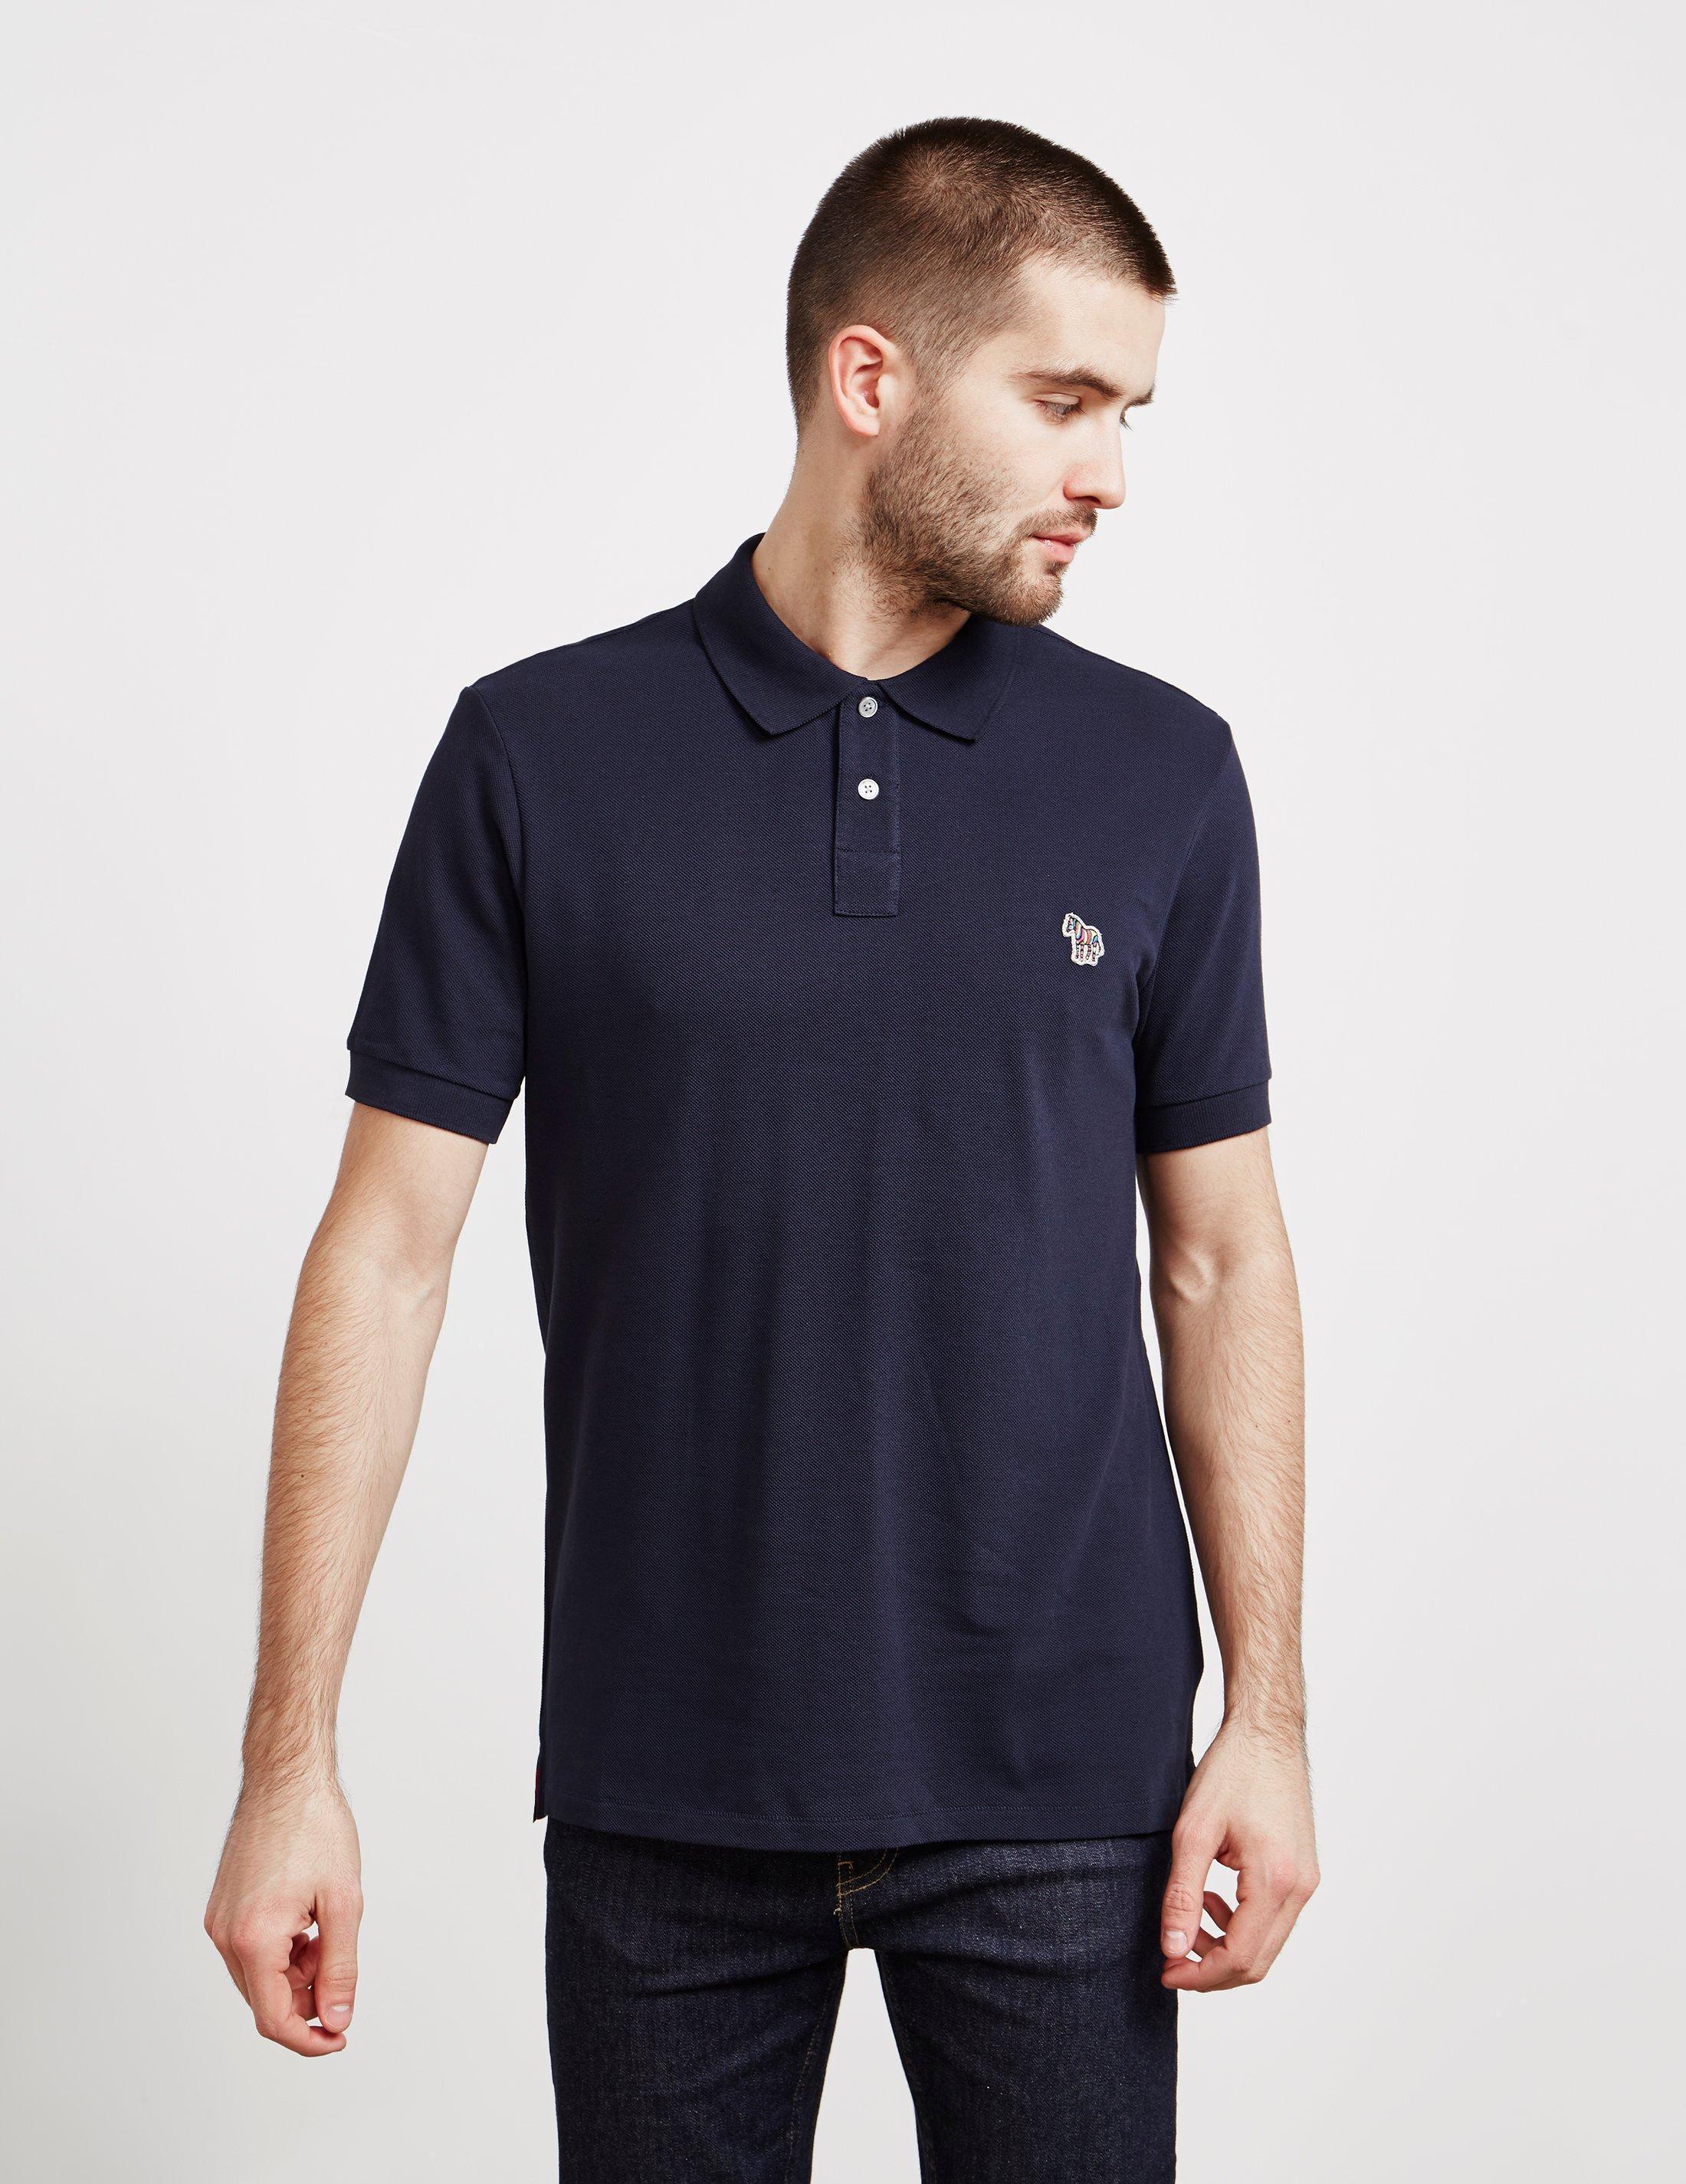 b4682694b06461 Lyst - PS by Paul Smith Zebra Short Sleeve Polo Shirt Navy Blue in ...